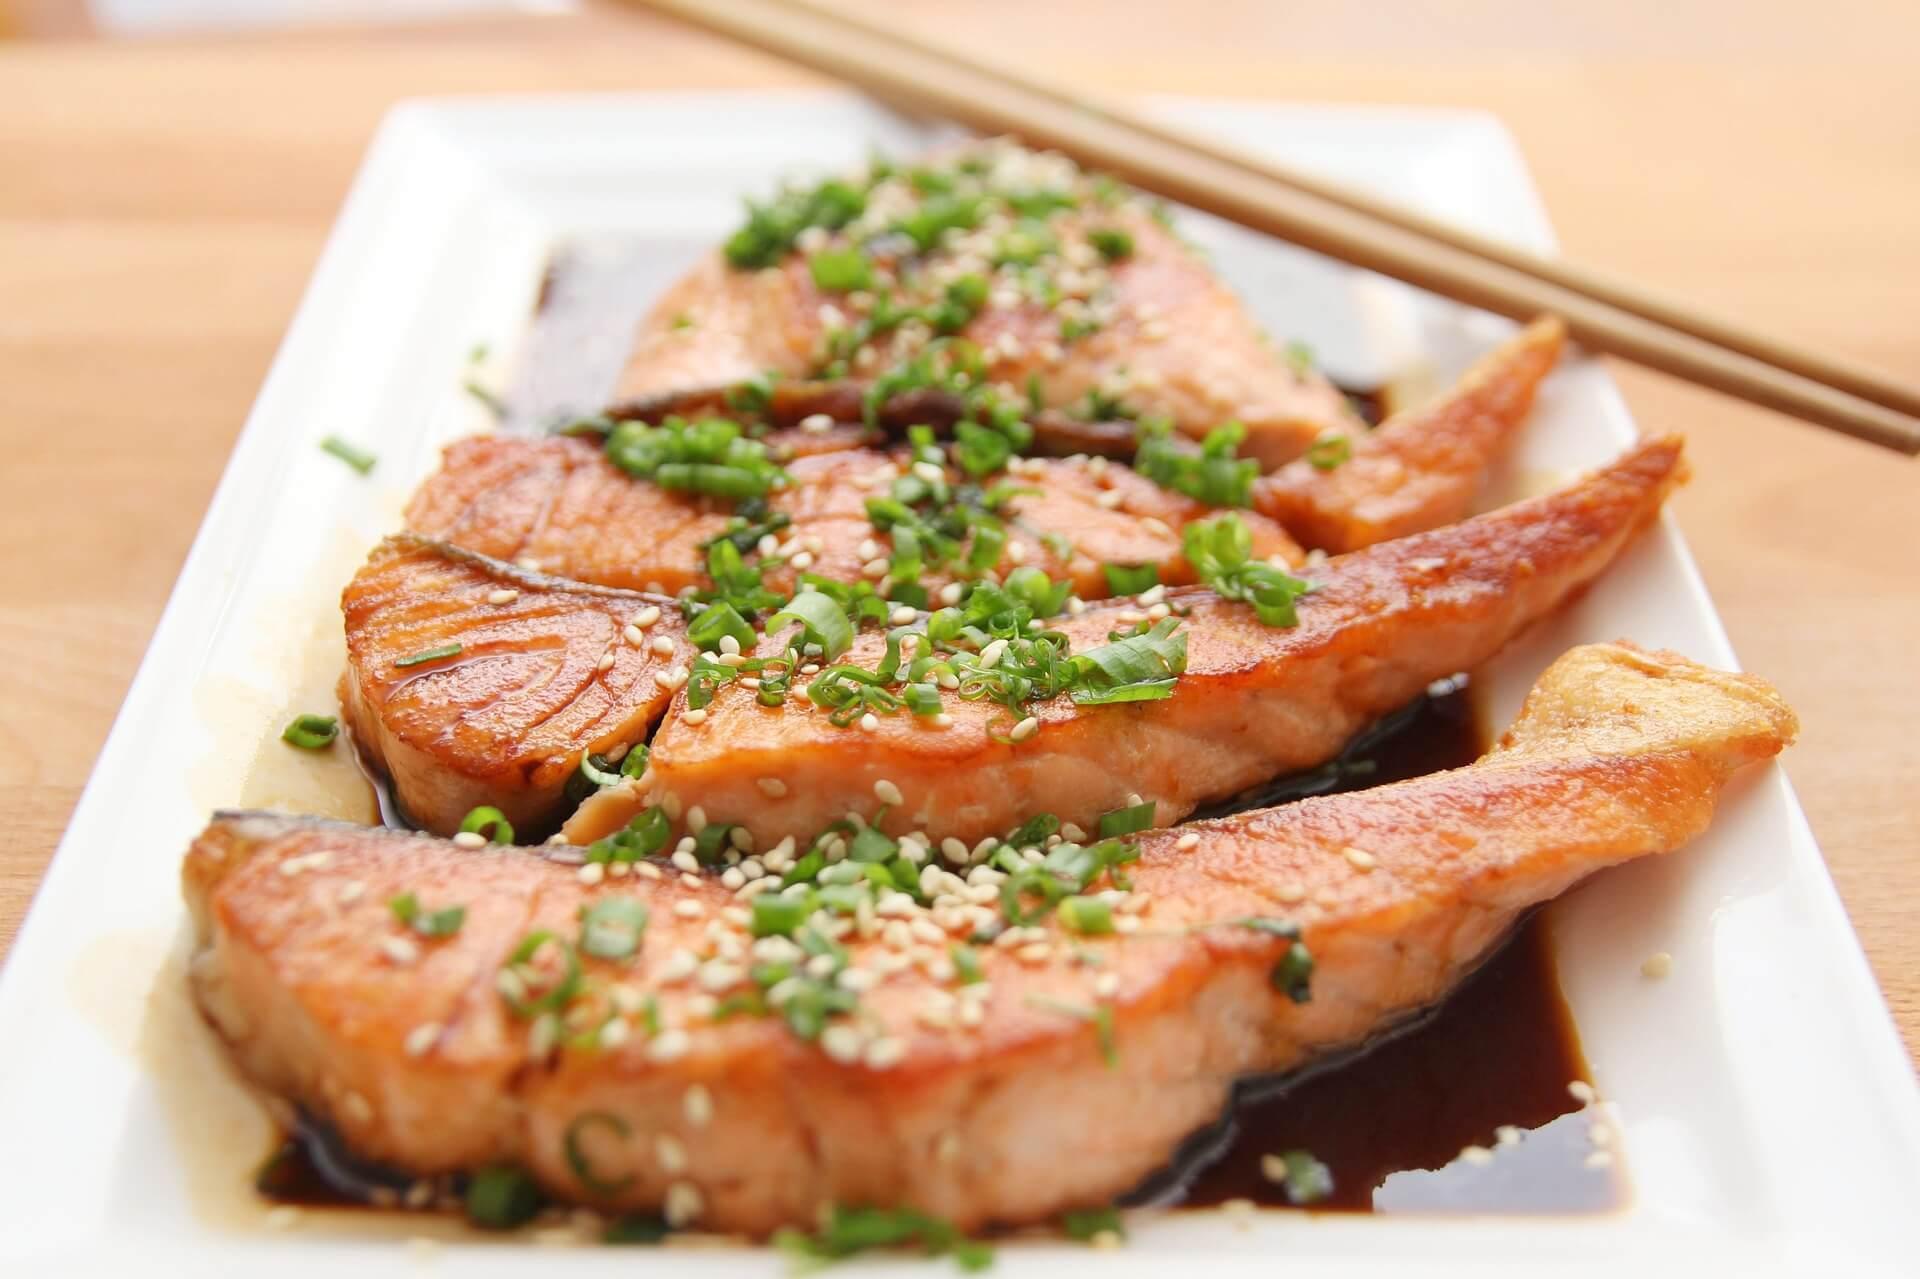 Eat salmon for vitamin b12 deficiency.